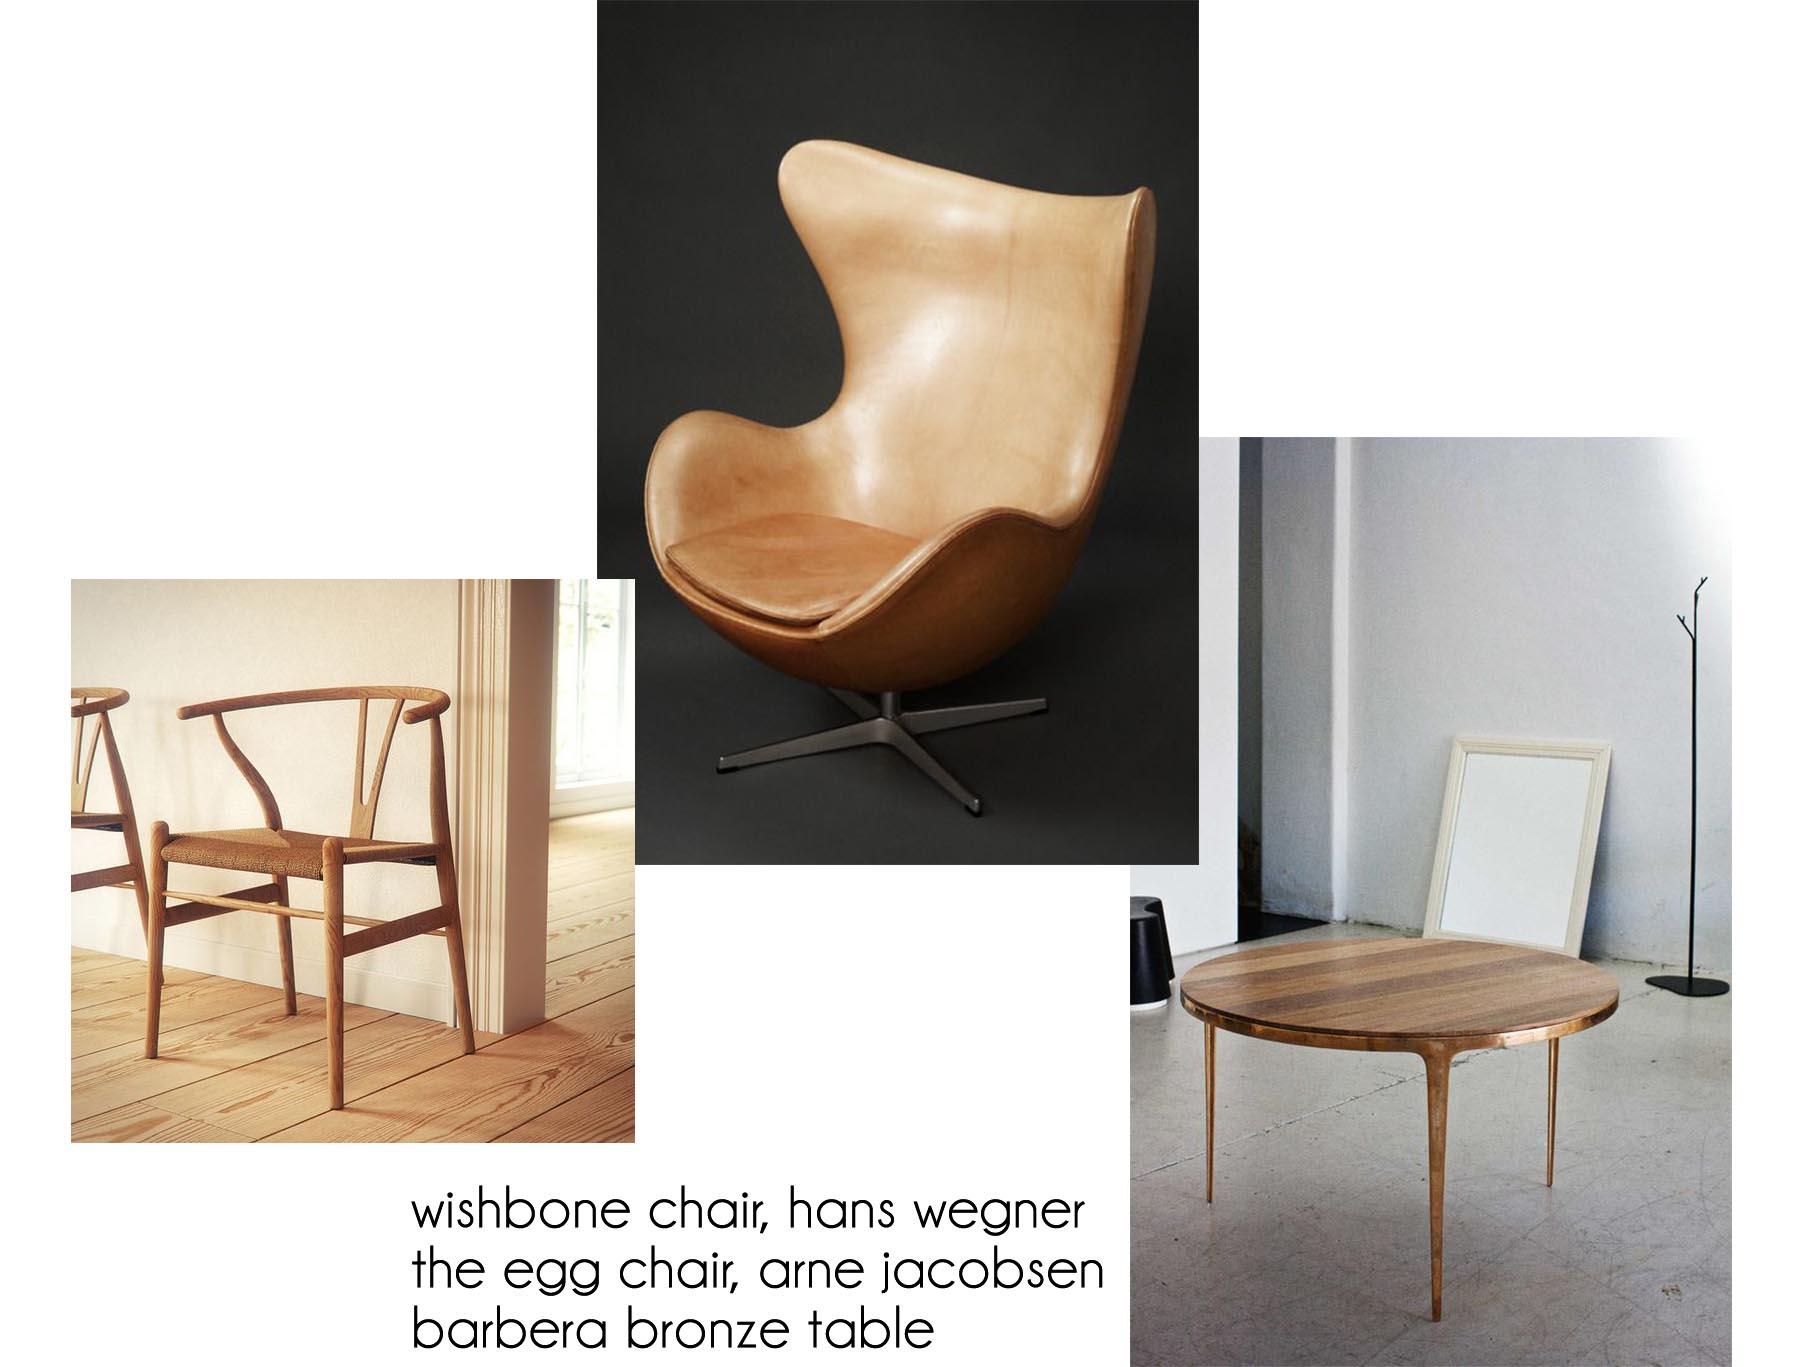 the egg chair arne jacobsen Isamu Noguchi Hans Wegner wishbone.jpg